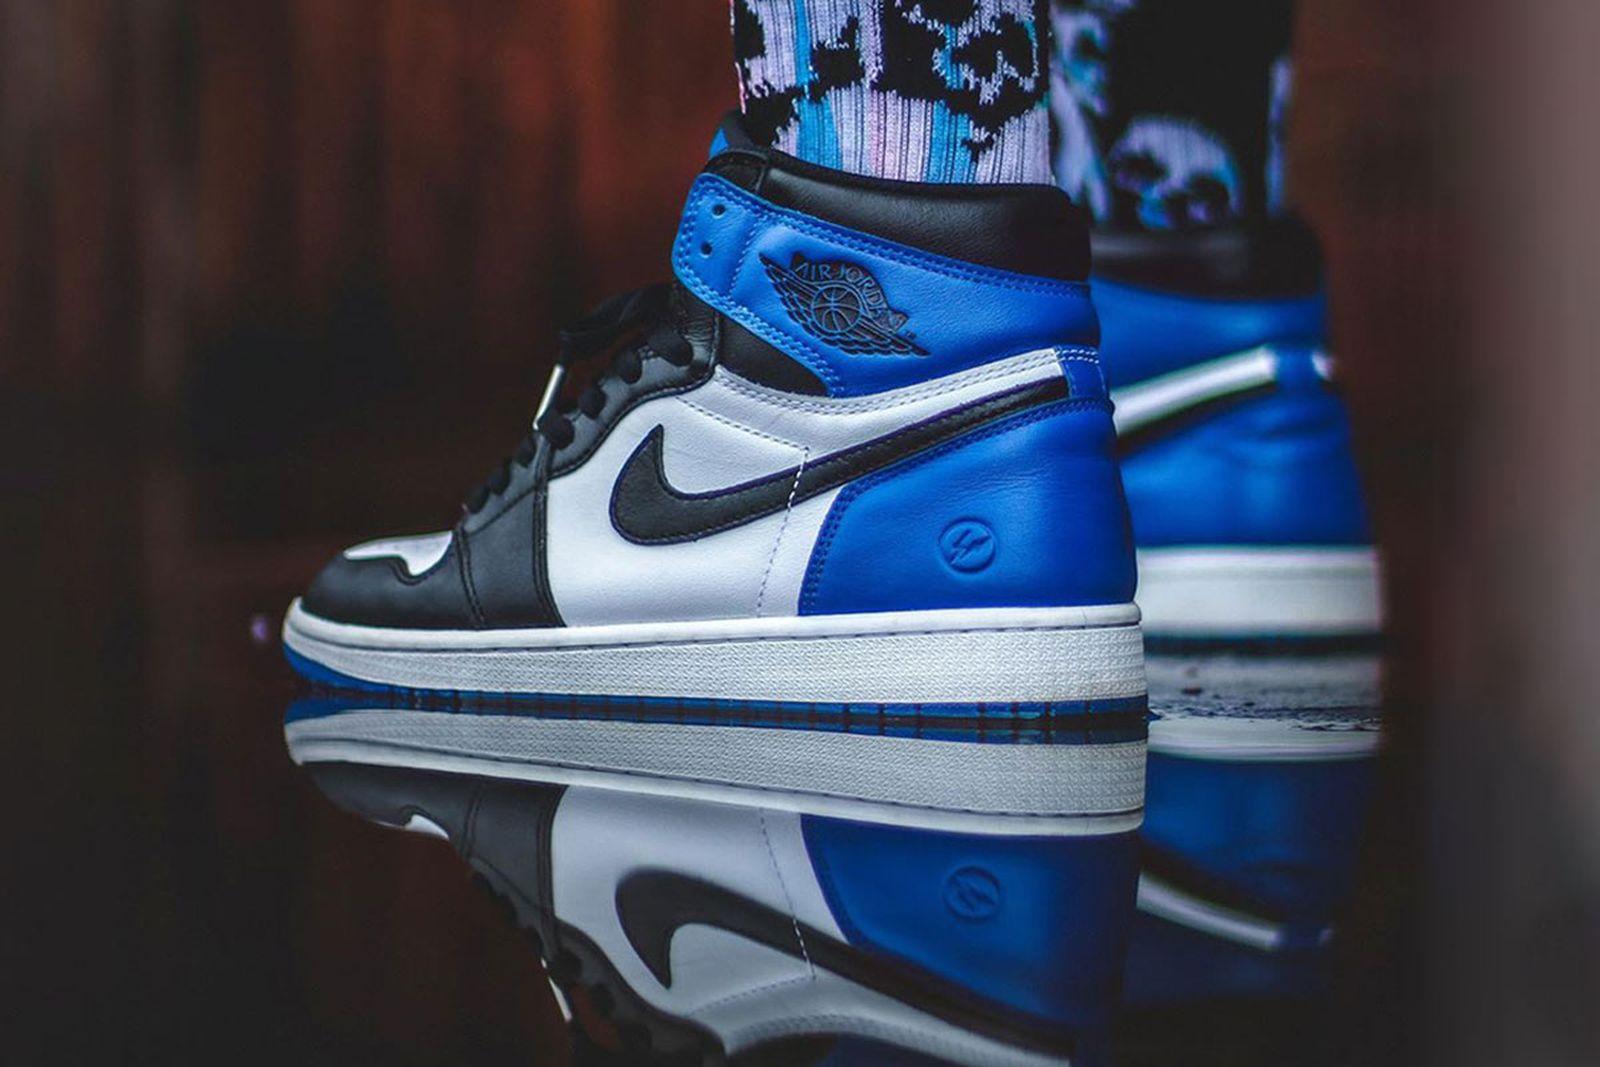 "fragment air jordan 1 retro best instagram sneakers Fear of God x Nike Air Raid ""Light Bone Fragment x Nike Air Jordan 1 Retro High OG MMW x Nike Removable Vibram Outsole"